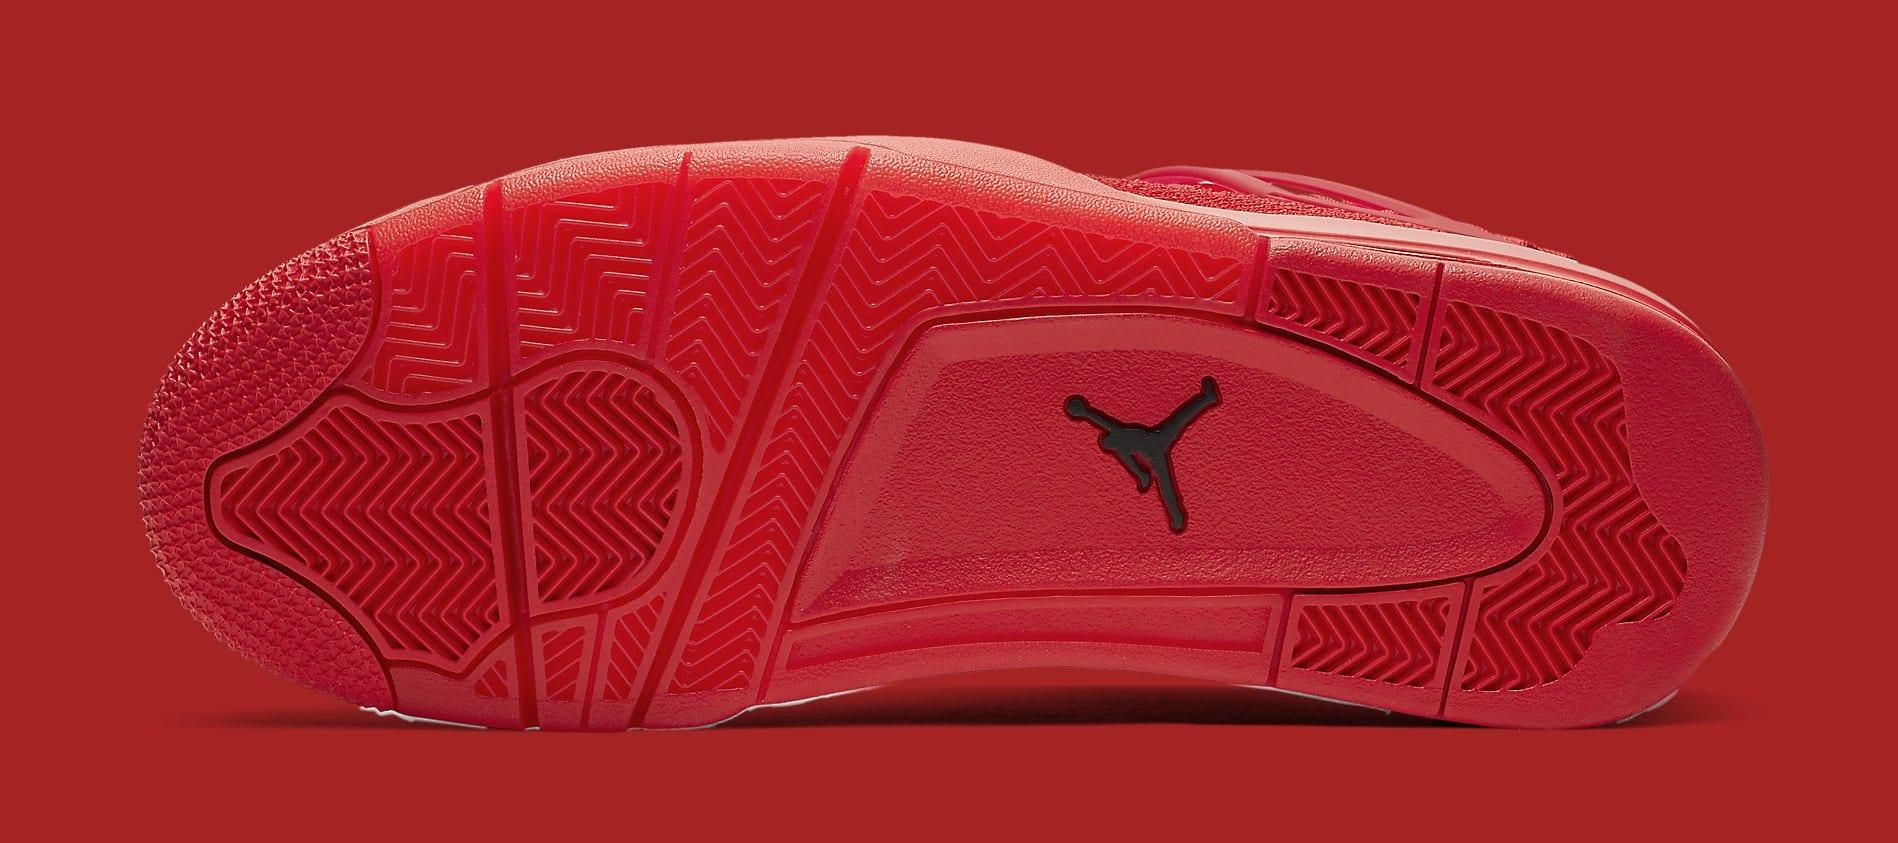 Air Jordan 4 Flyknit 'University Red' AQ3559-600 Sole